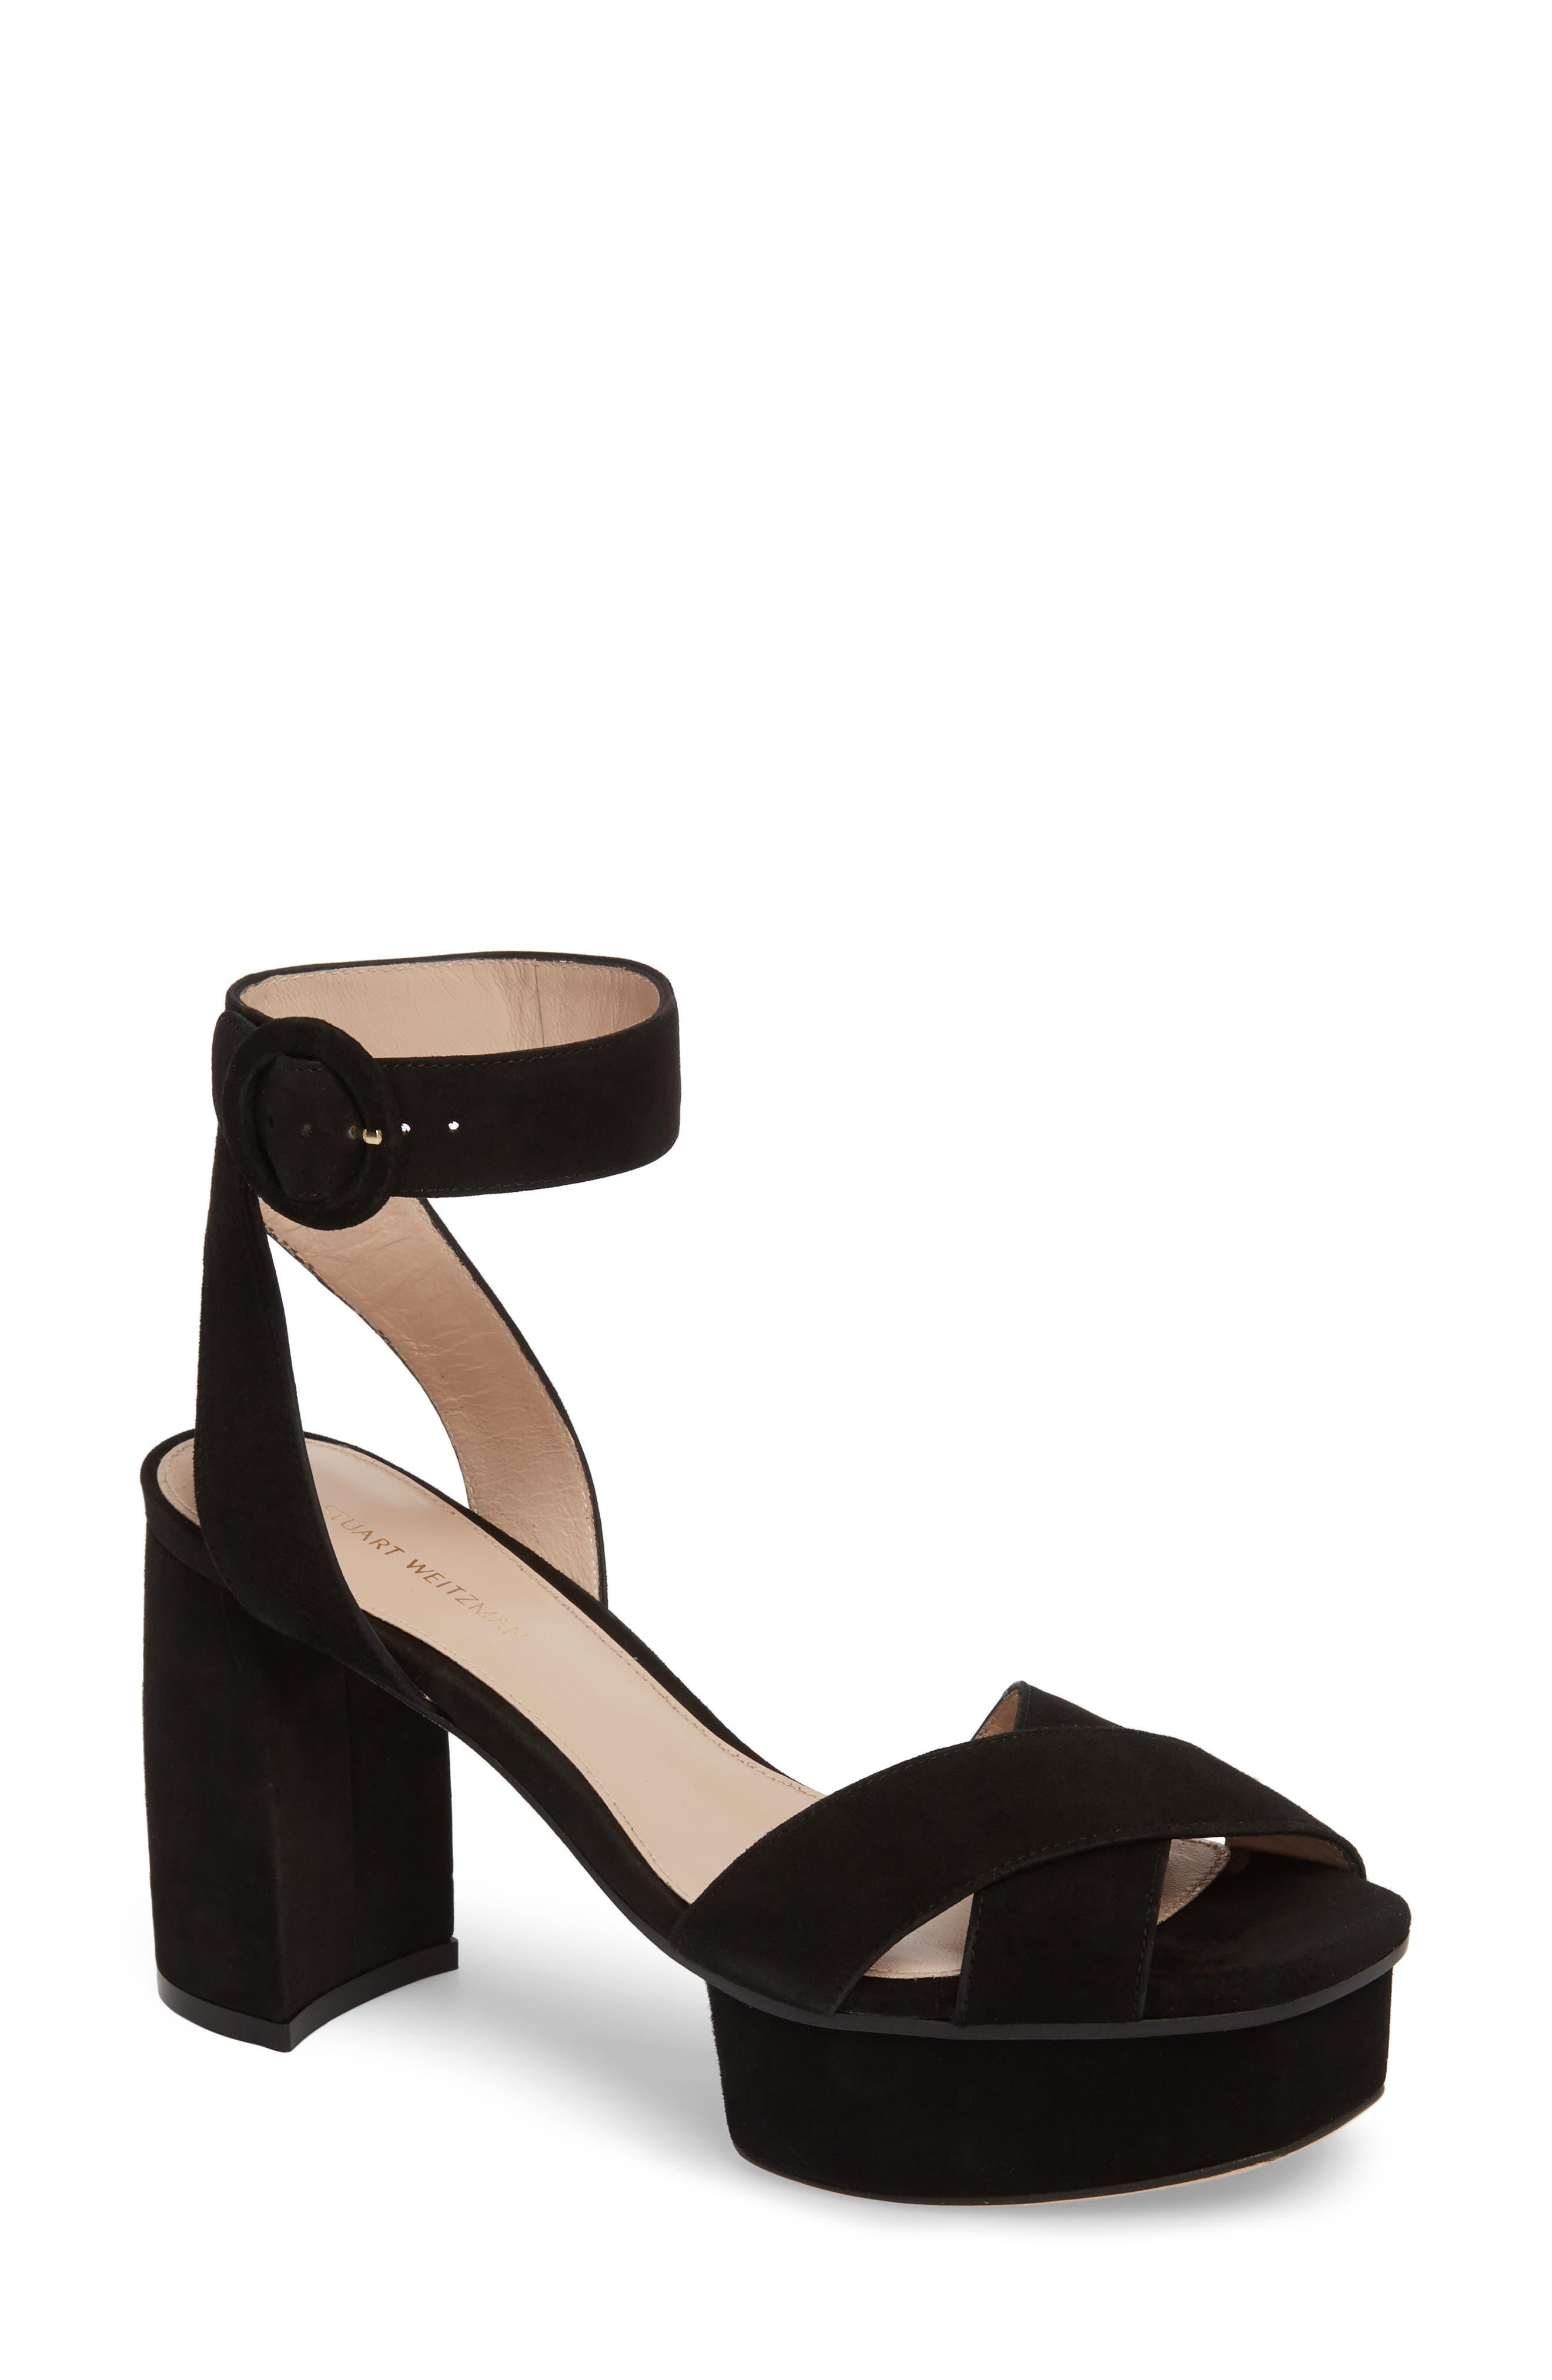 Carmina Ankle Strap Platform Sandal,                             Main thumbnail 1, color,                             Black Seda Suede